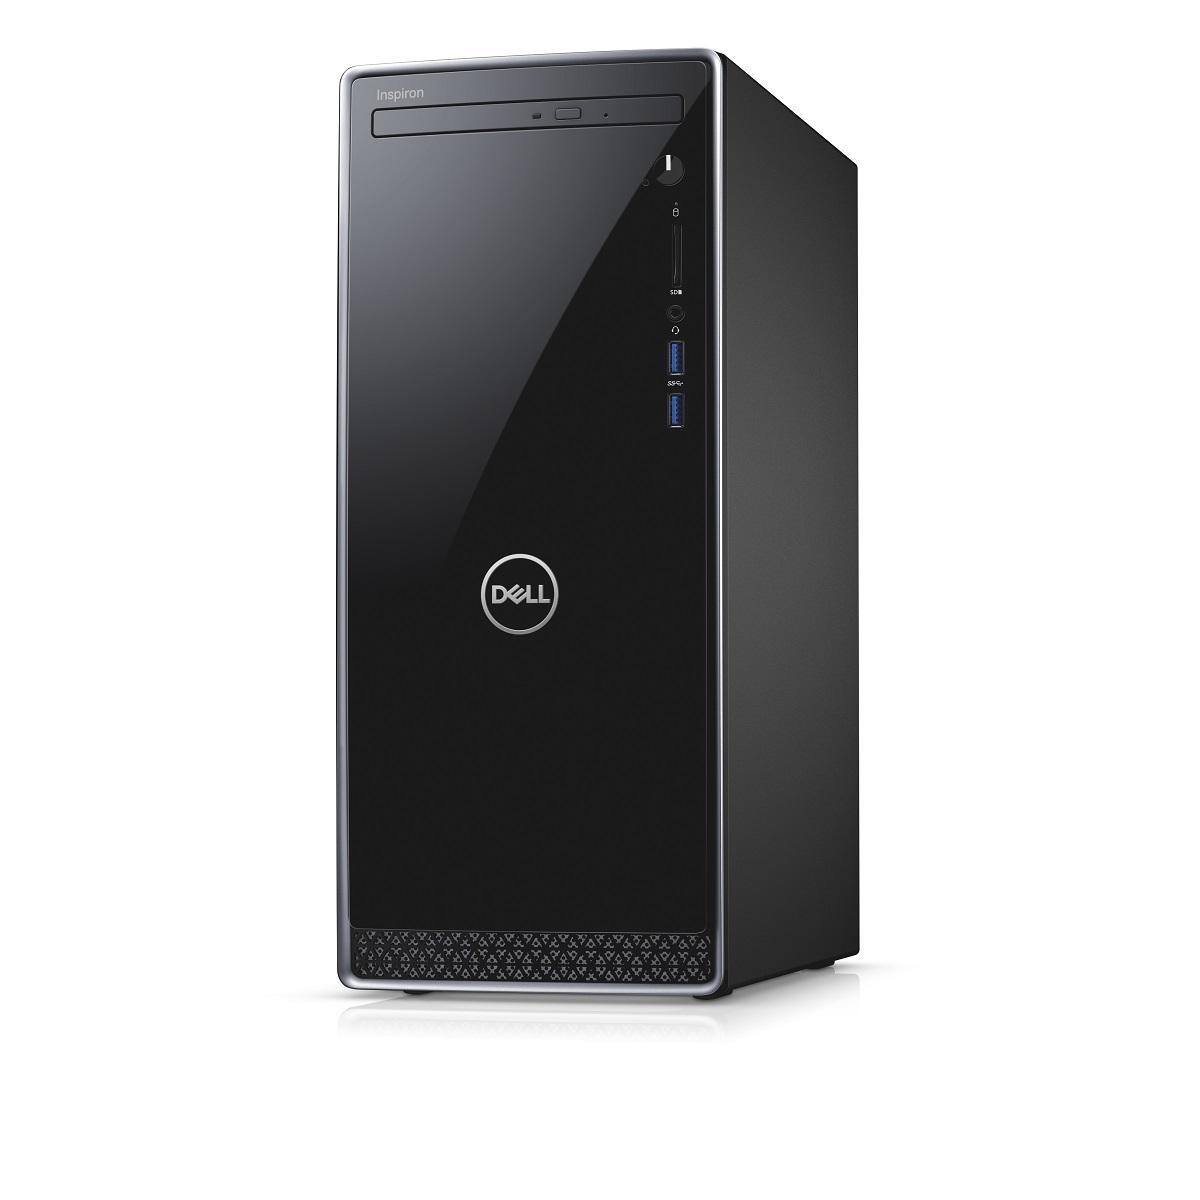 New Inspiron Desktop (3670)